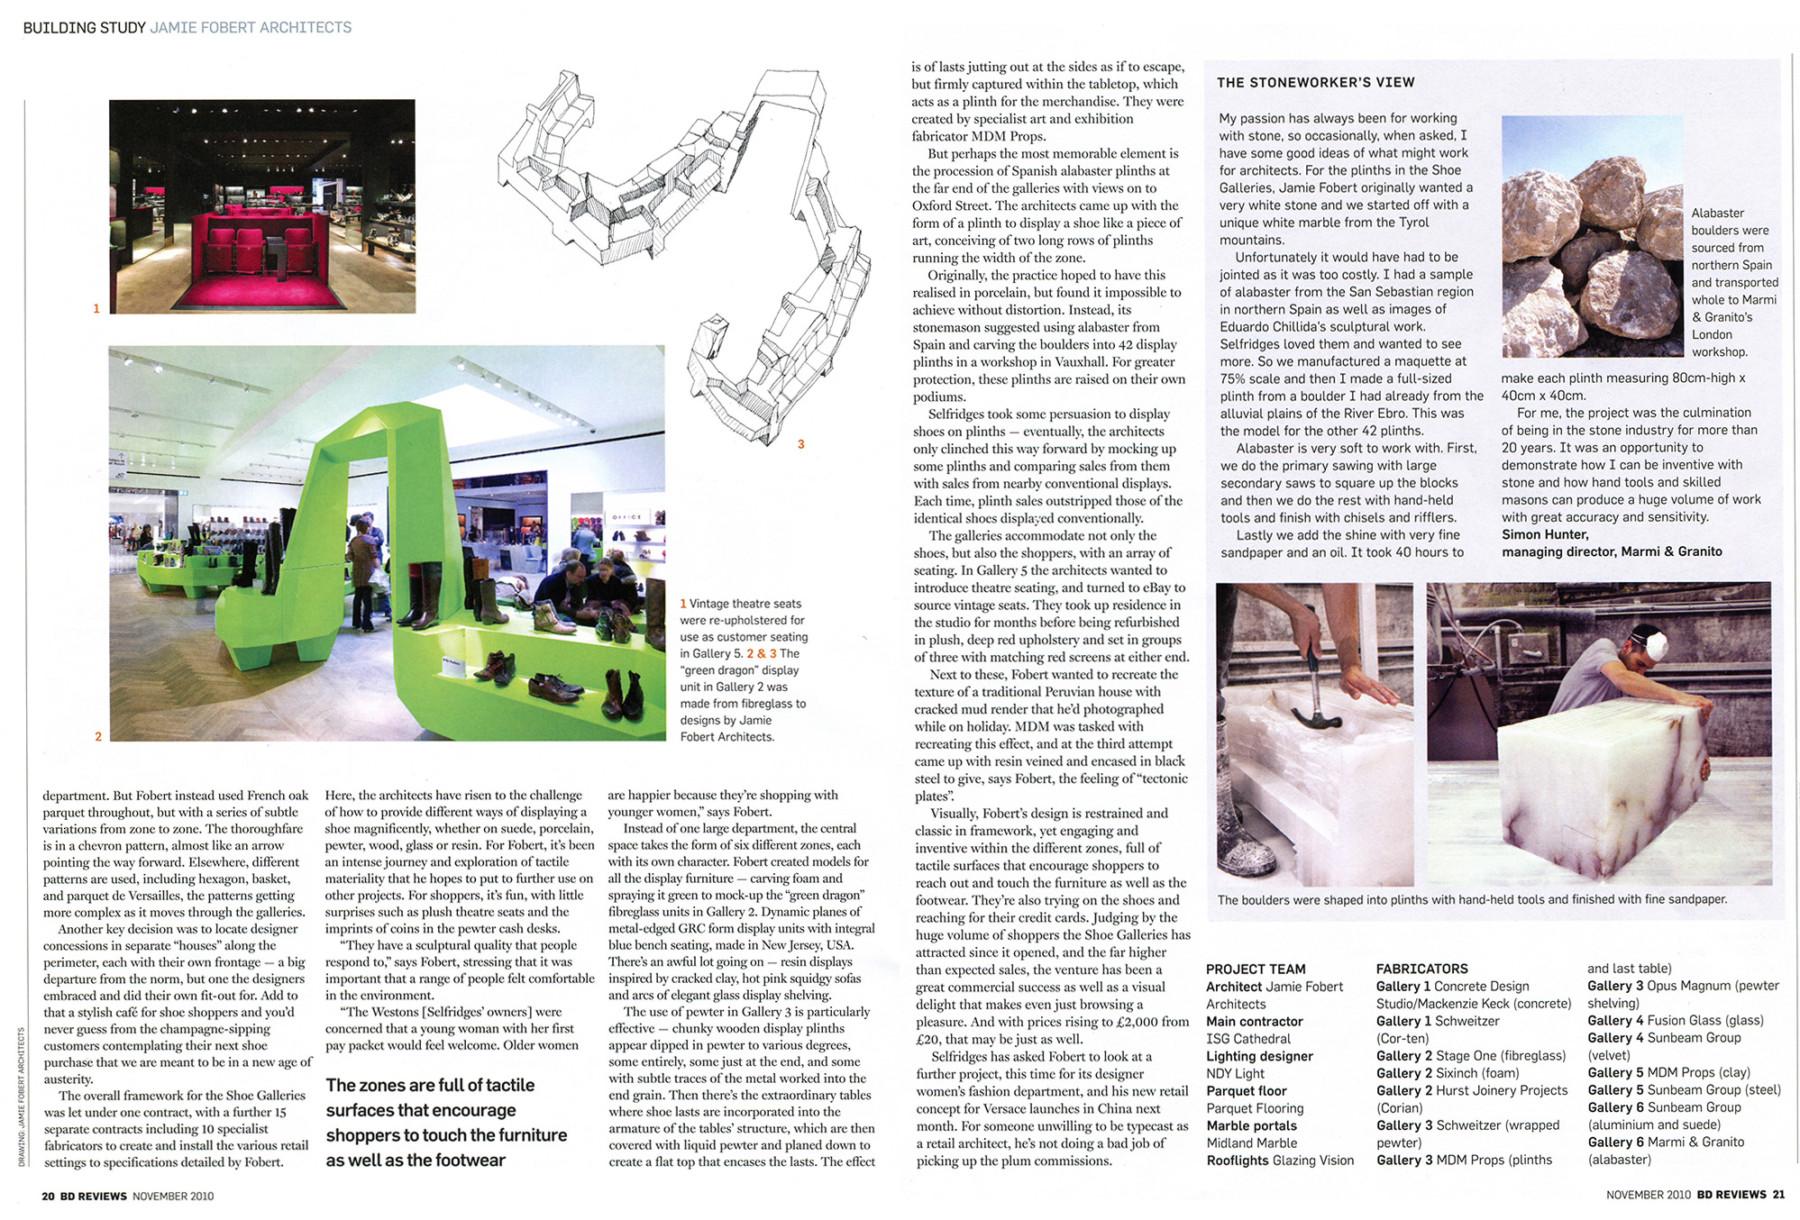 Jamie-Fobert-Architects-Selfridges-Shoes-Article-Press-BD 3